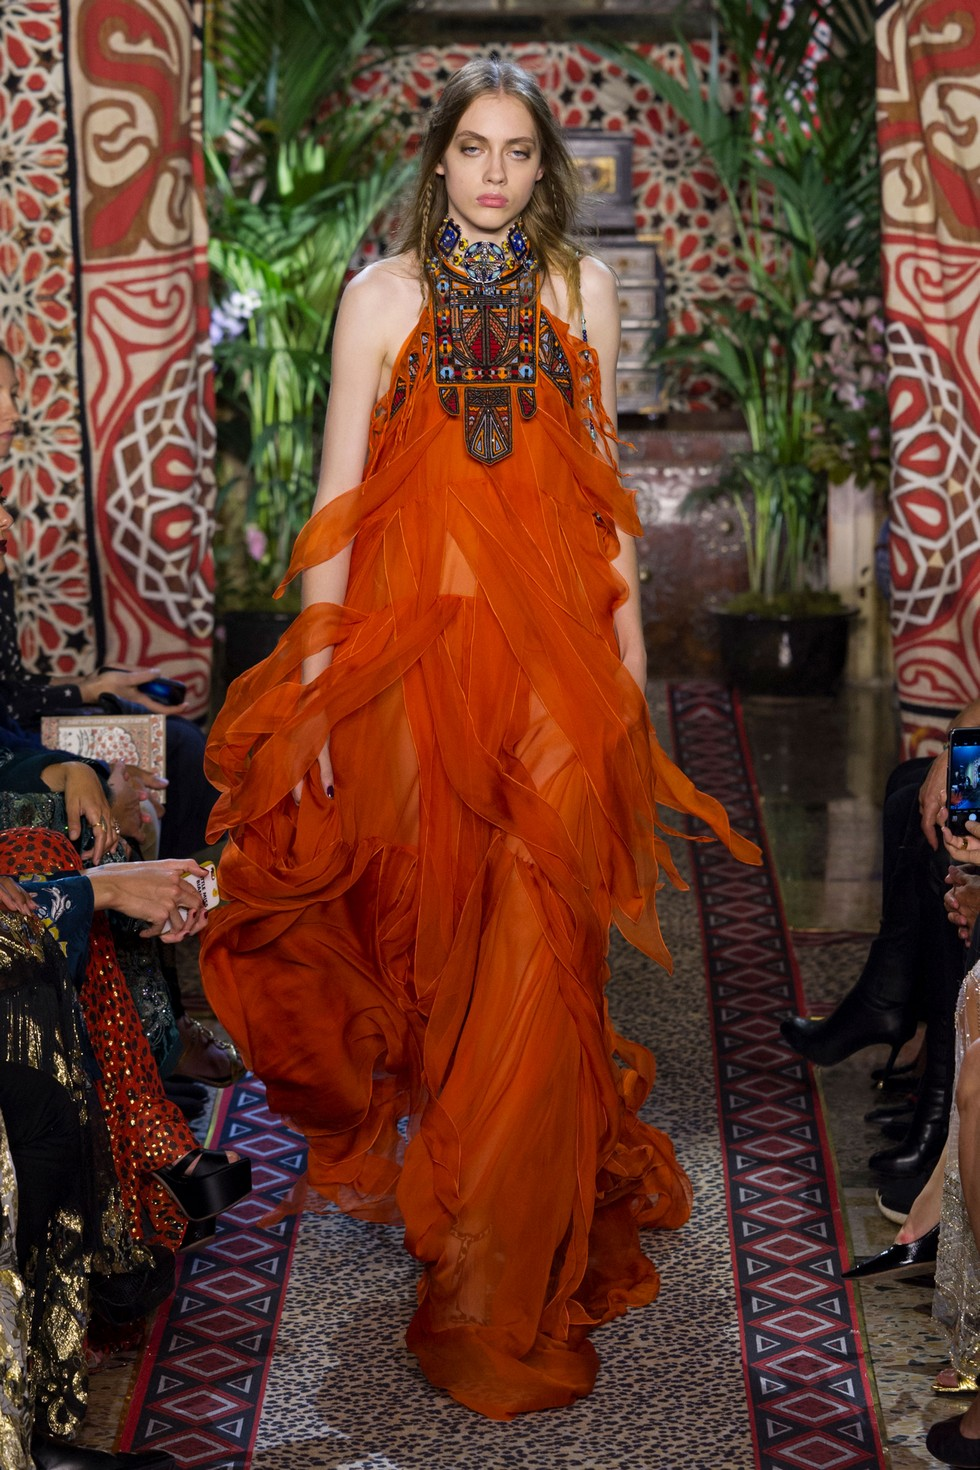 Roberto Cavalli fashion dresses milan fashion spring summer 2017 Milan Fashion Spring Summer 2017 – day one best moments Roberto Cavalli 6